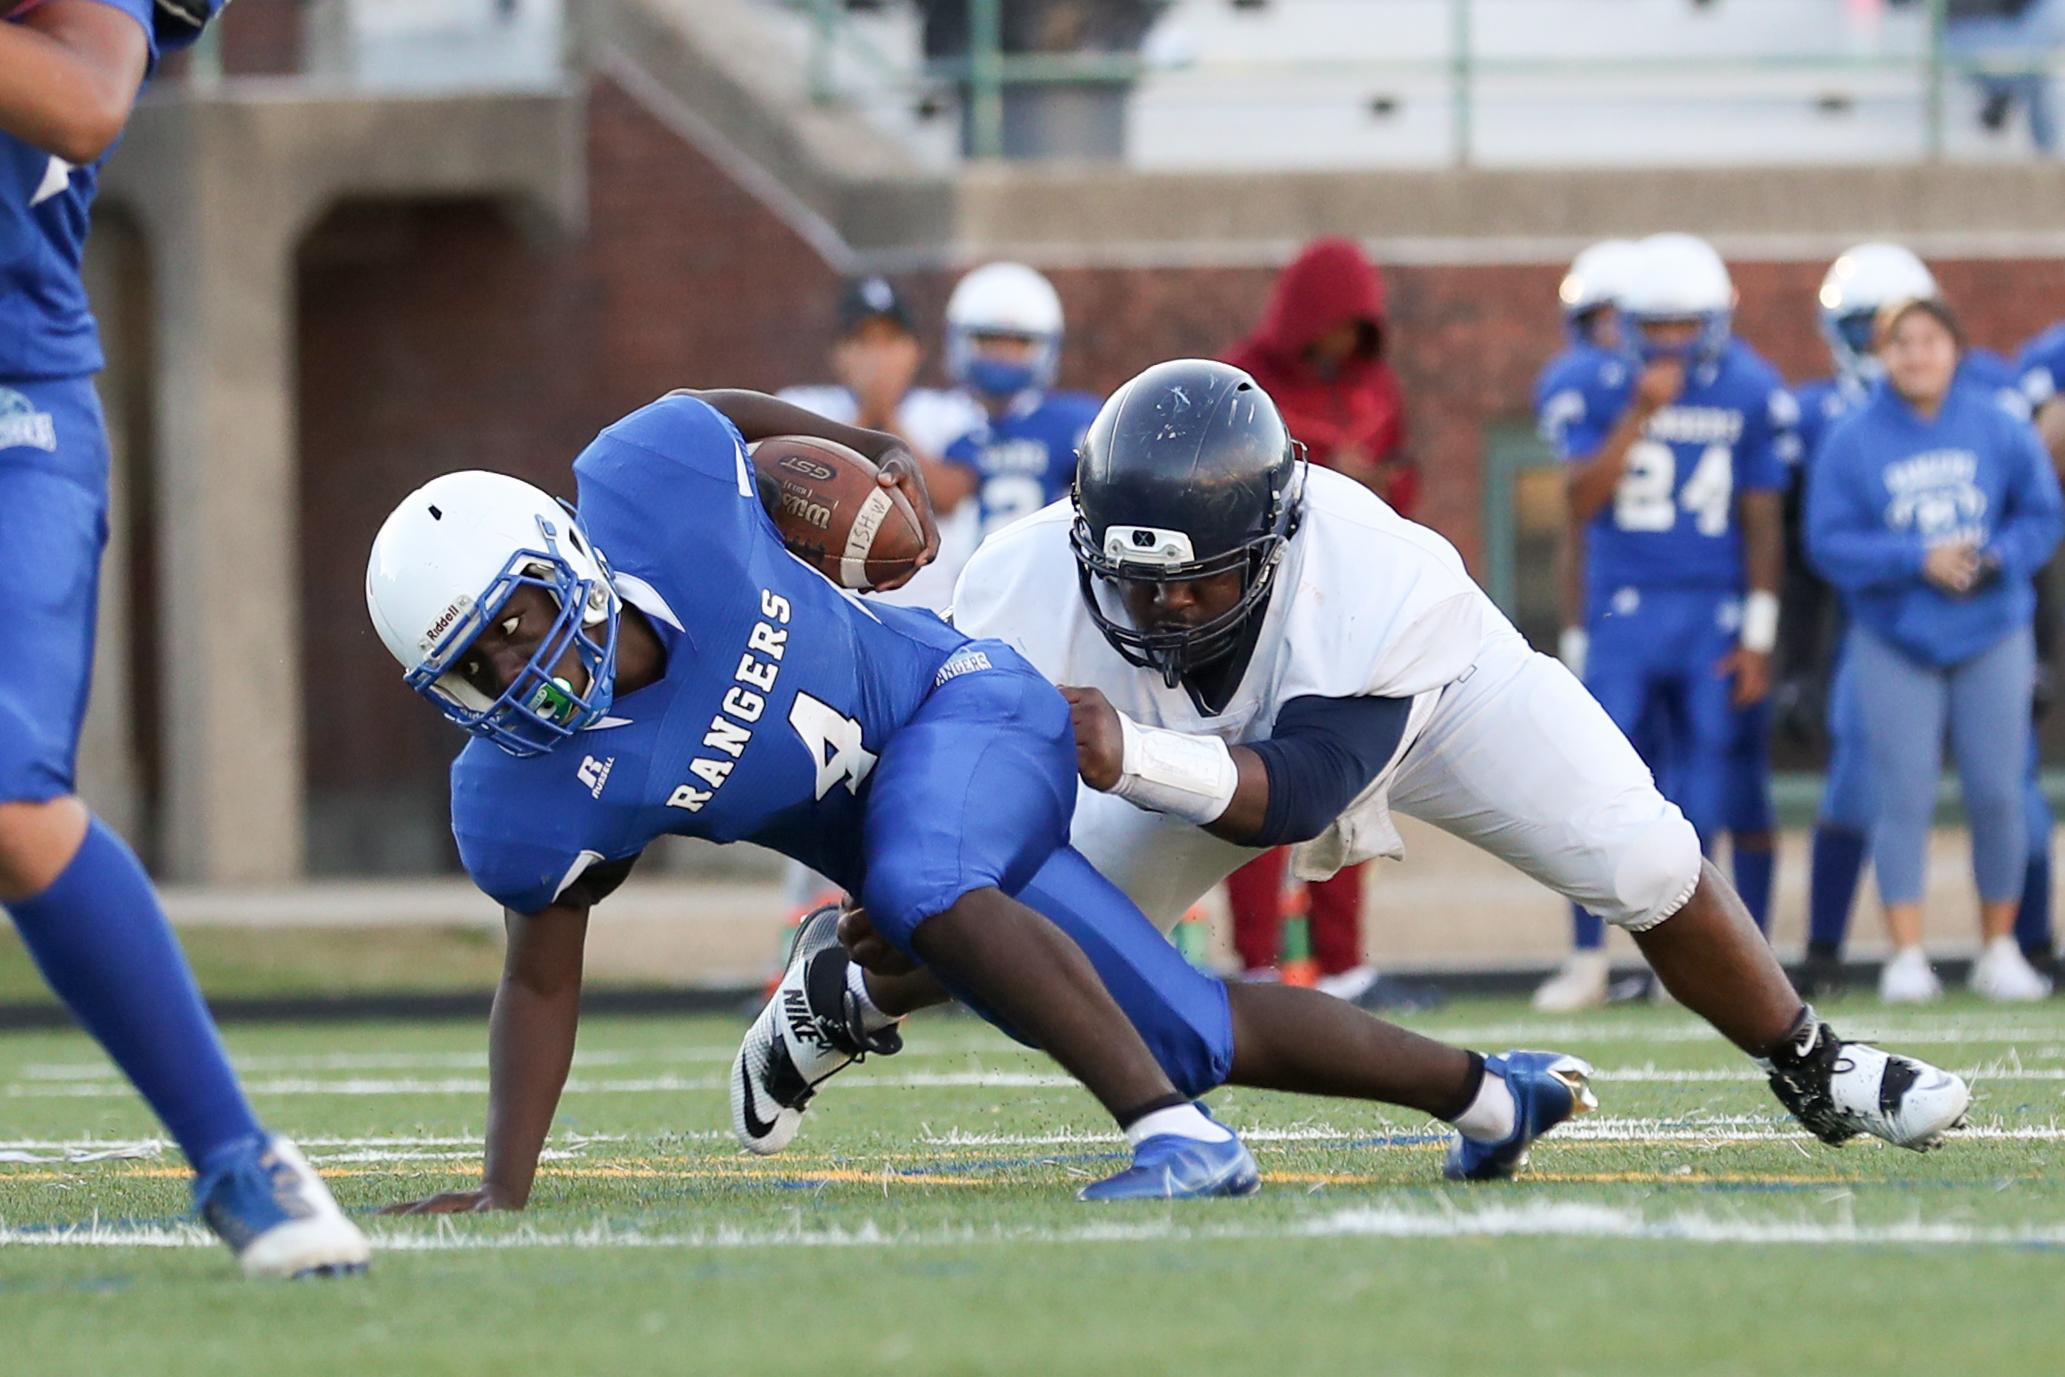 Mather's Jacob Scott (4) scrambles to get past Hyde Park's defense to score a touchdown.